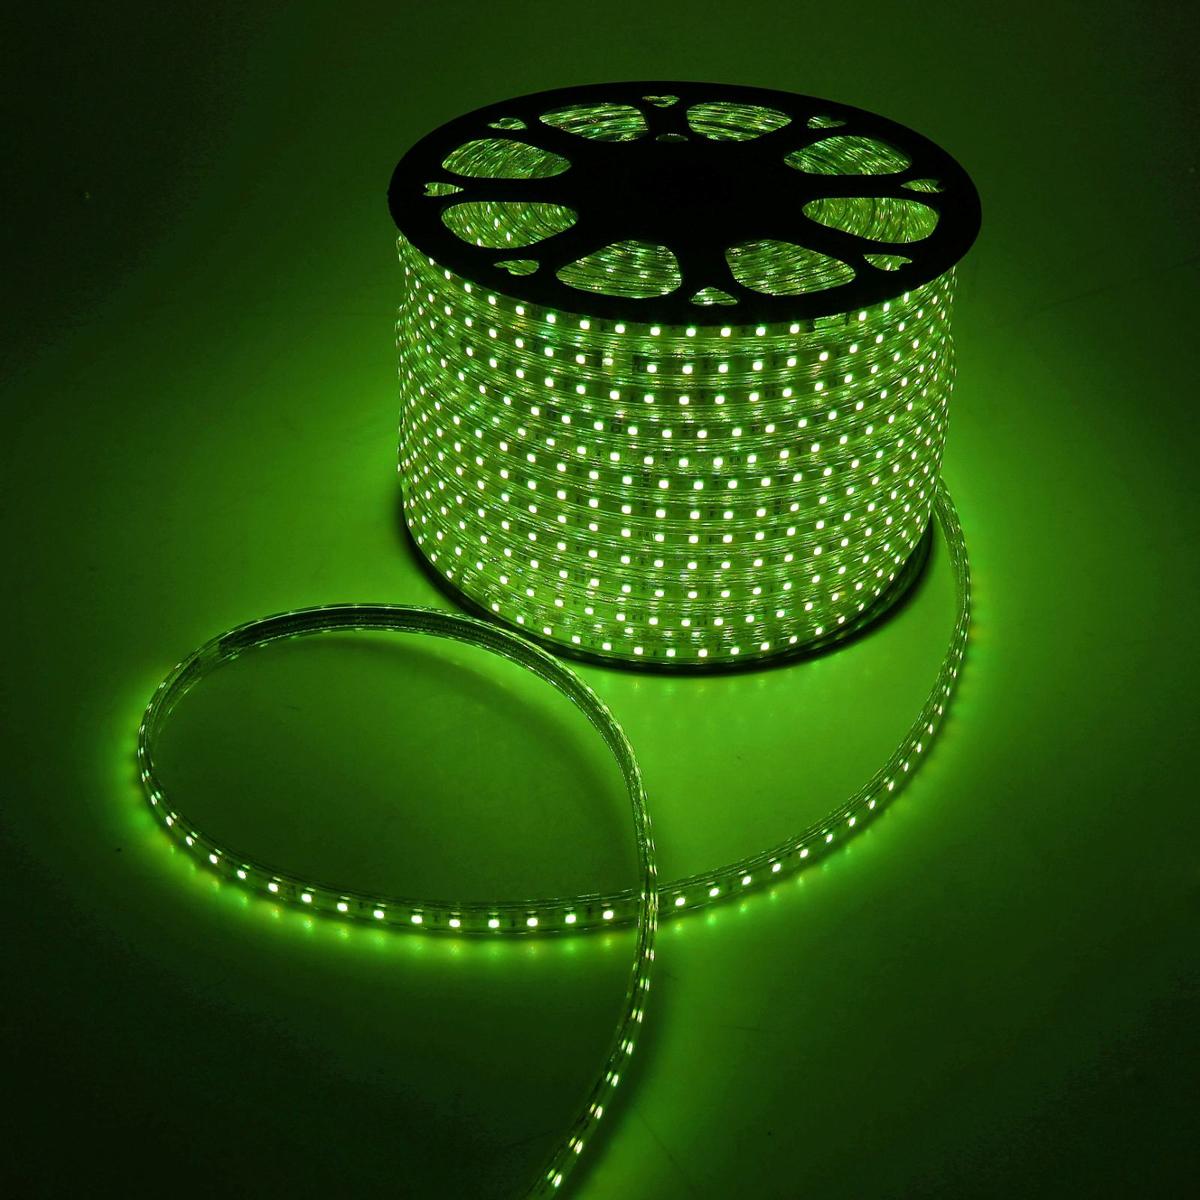 Светодиодная лента Luazon, 220В, SMD5050, длина 100 м, IP65, 60 LED ламп, 14.4 Вт/м, 16-18 Лм/1 LED, AC, цвет: зеленый ac 65 автостоп